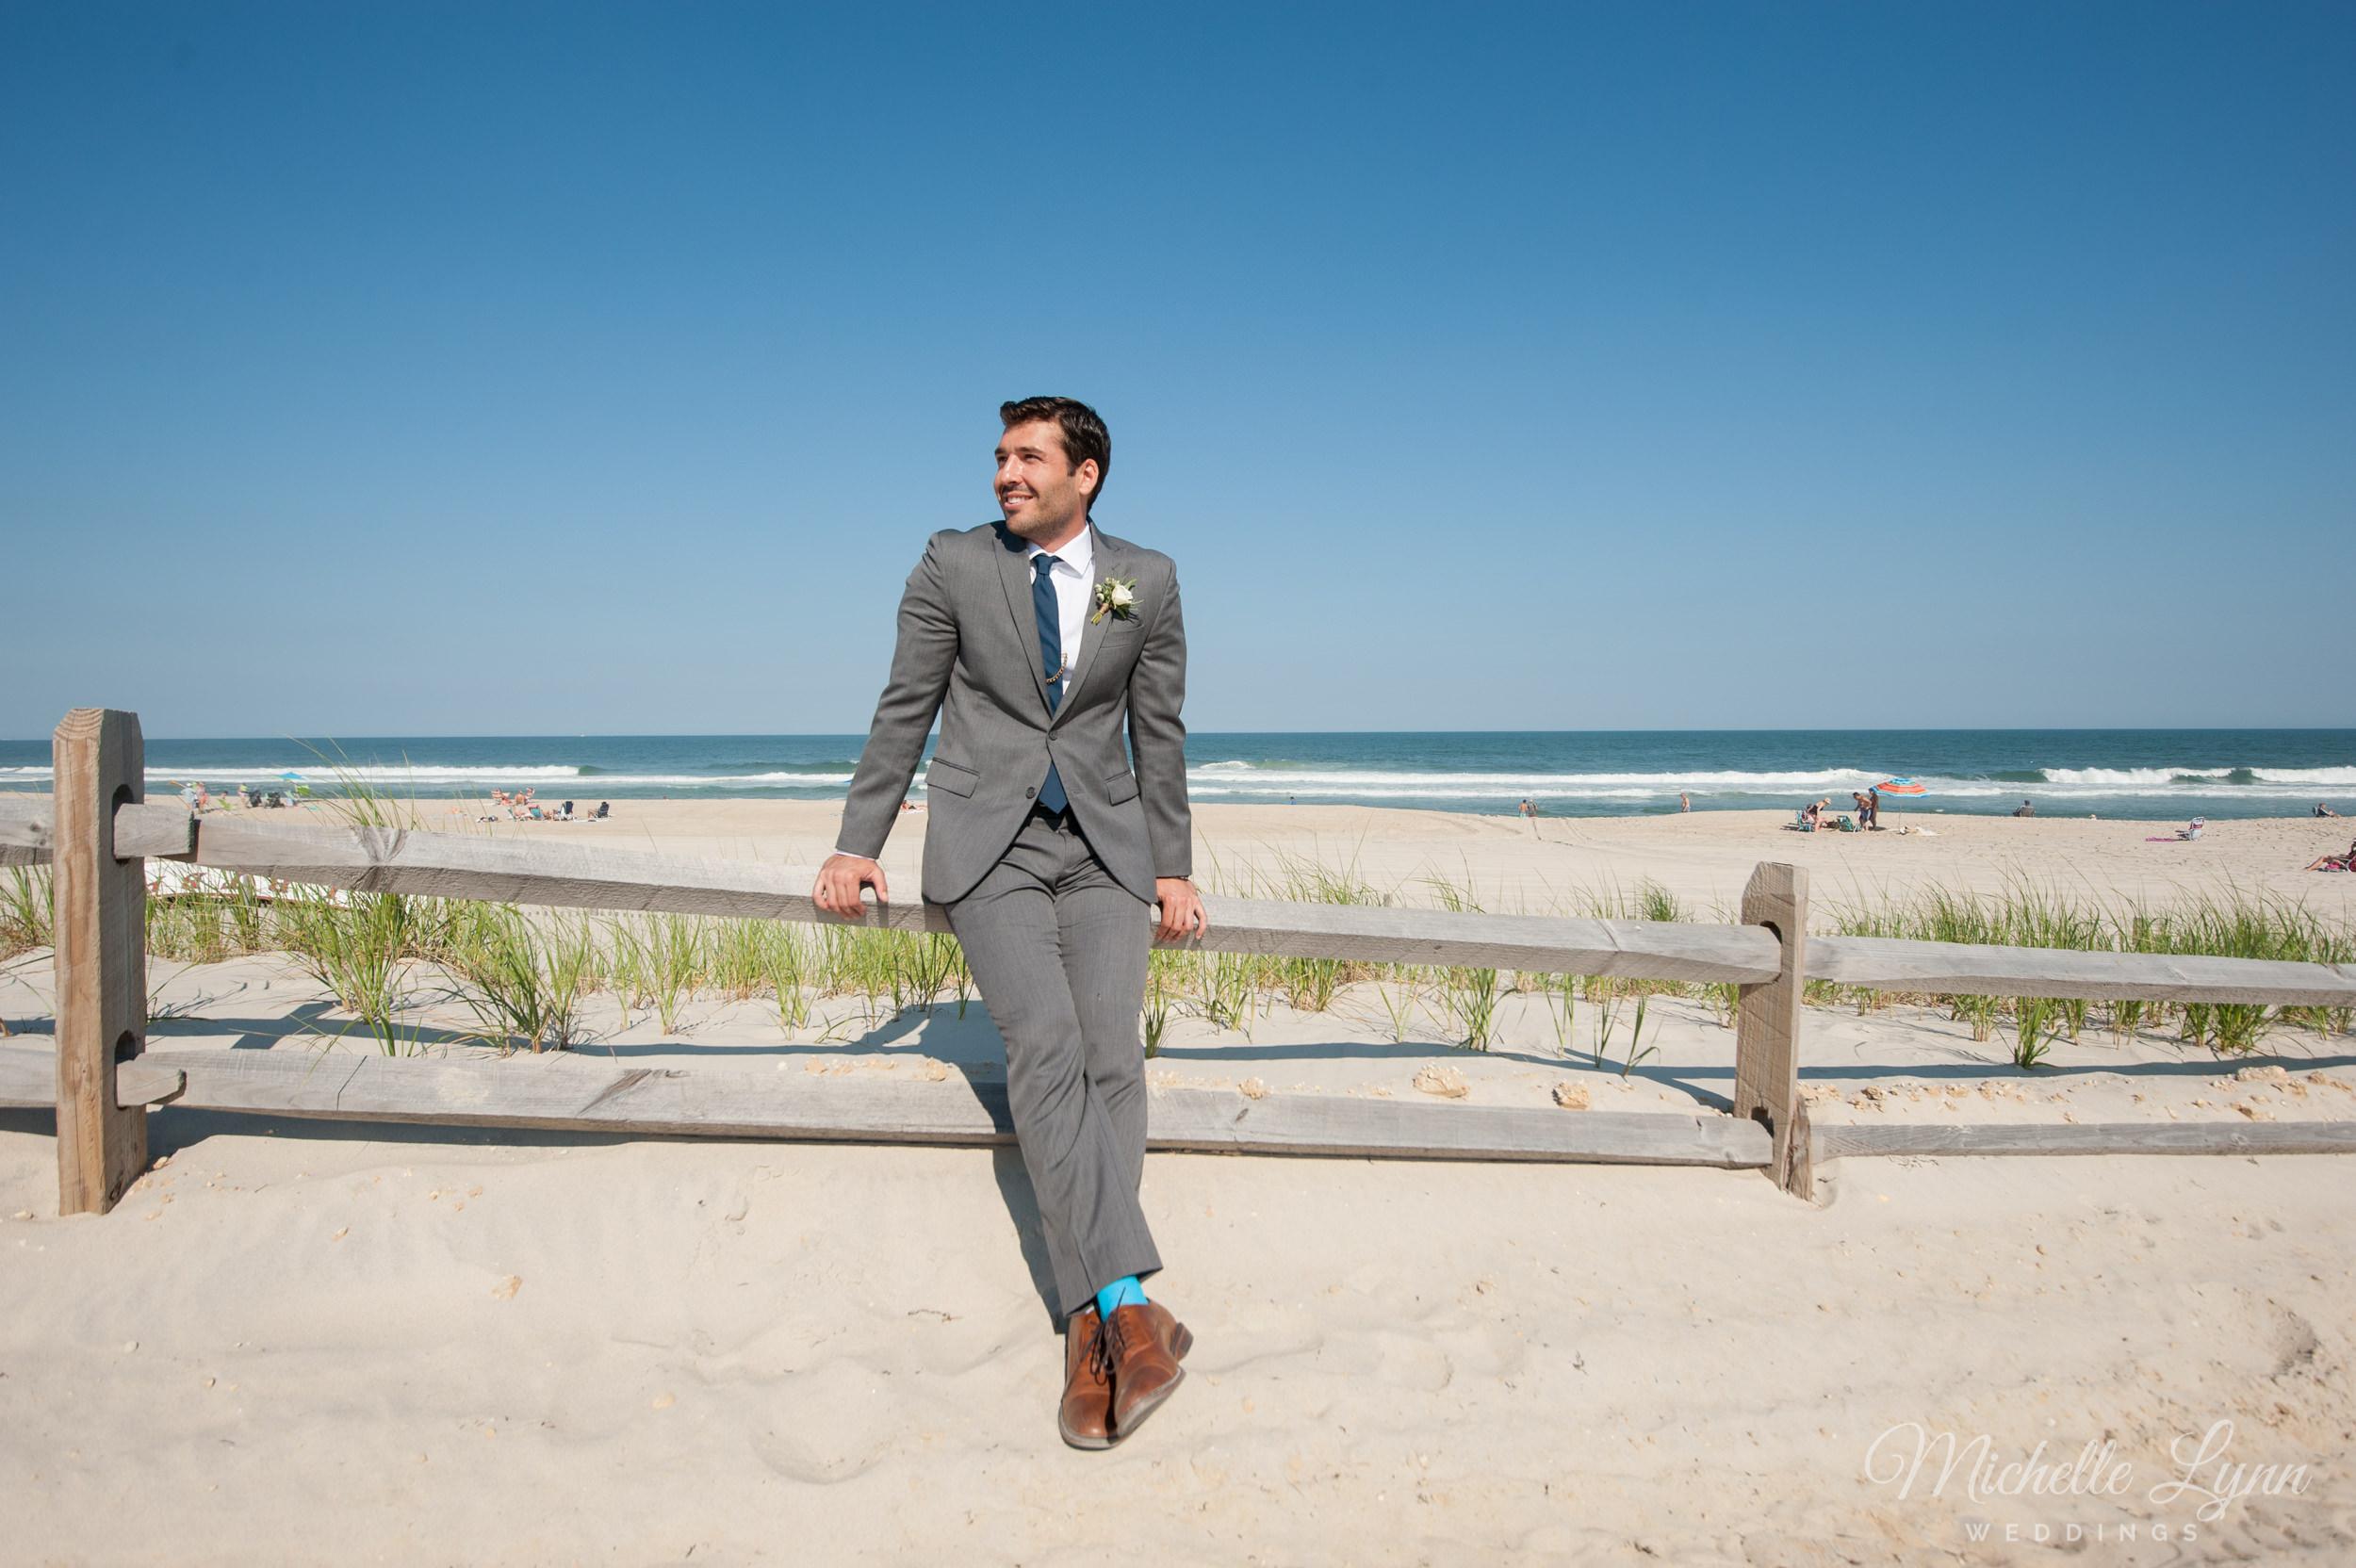 mlw-brant-beach-lbi-wedding-photography-8.jpg